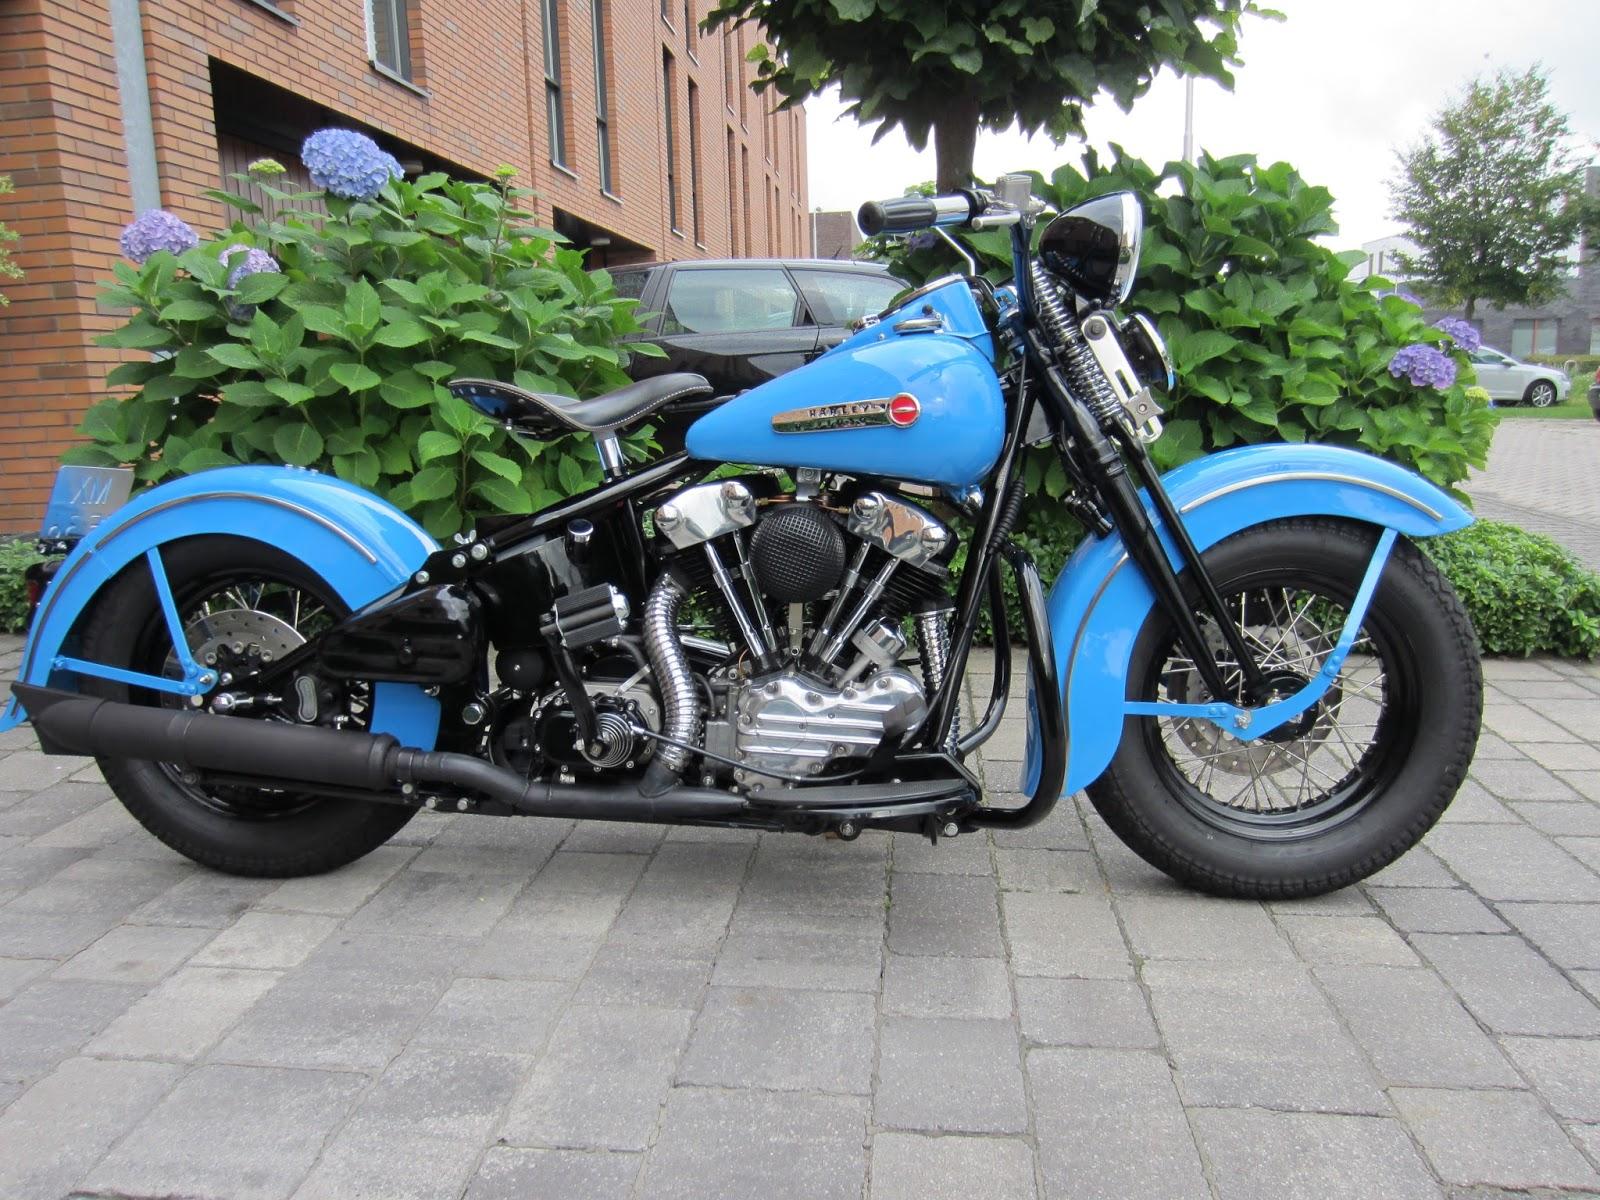 Harley Davidson: DD Motorcycles: HARLEY-DAVIDSON KNUCKLEHEAD FL 74 Cubic